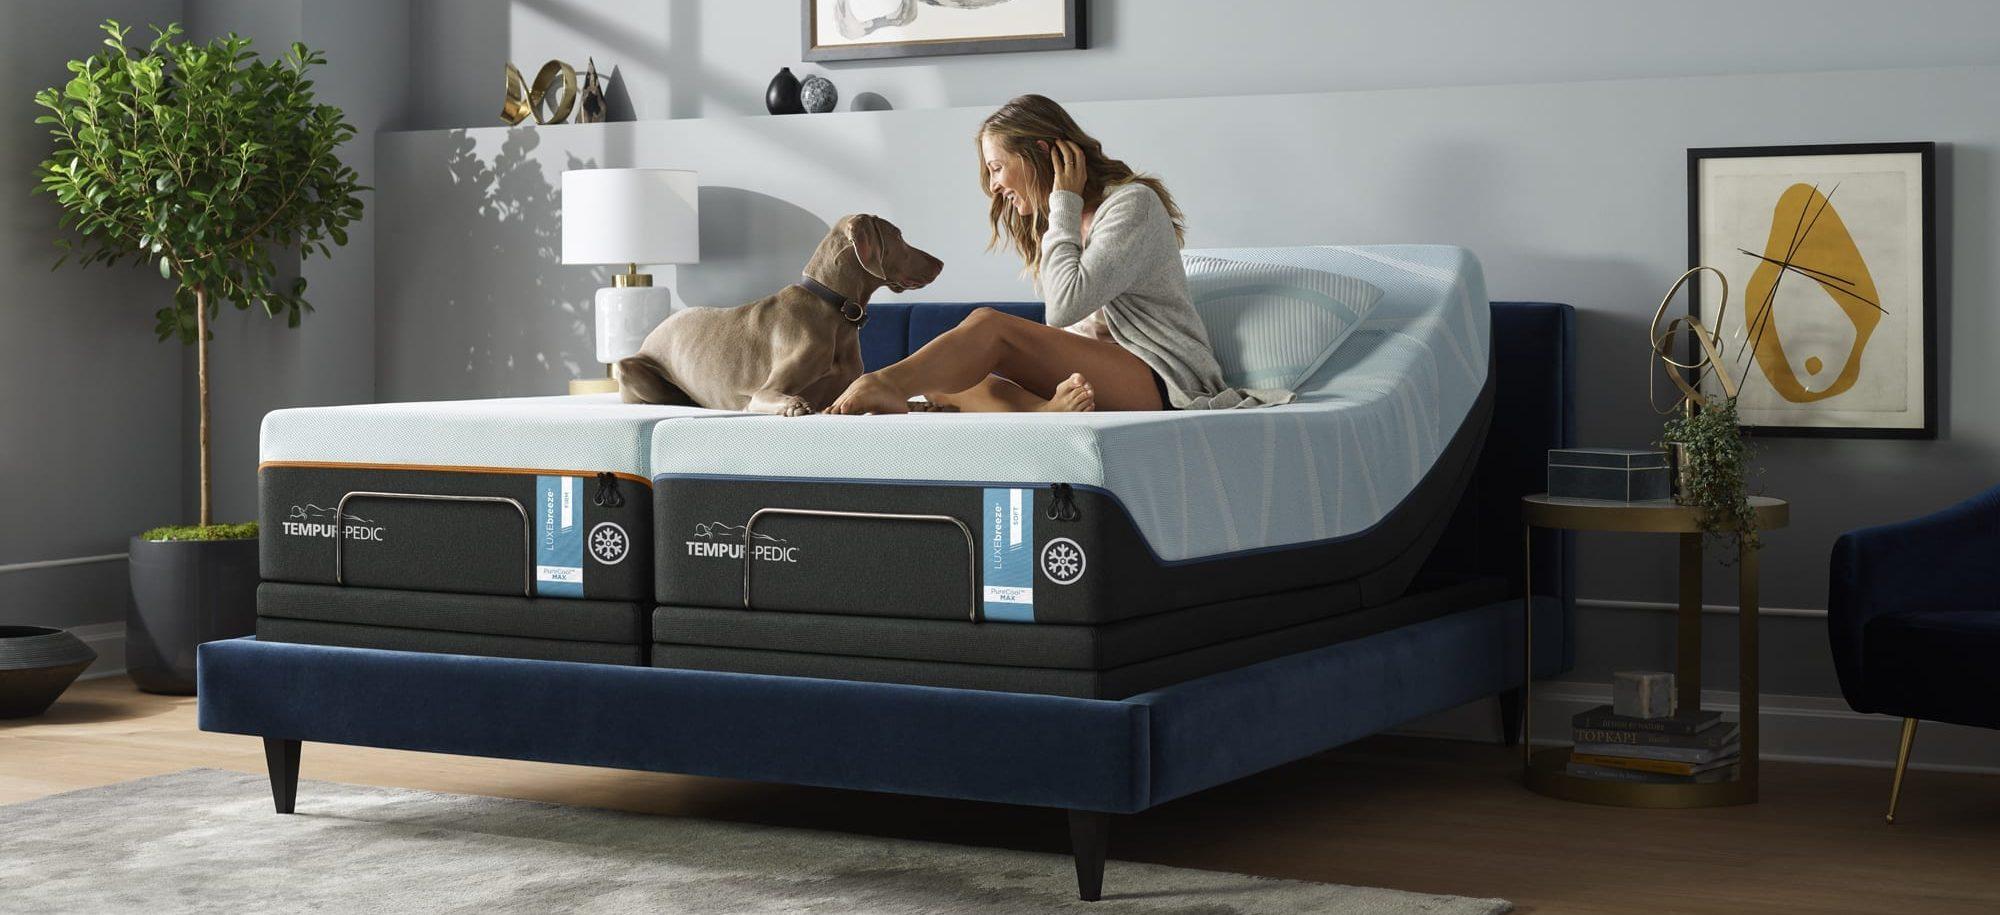 Tempur-Pedic LUXEbreeze° king bed adjustable base